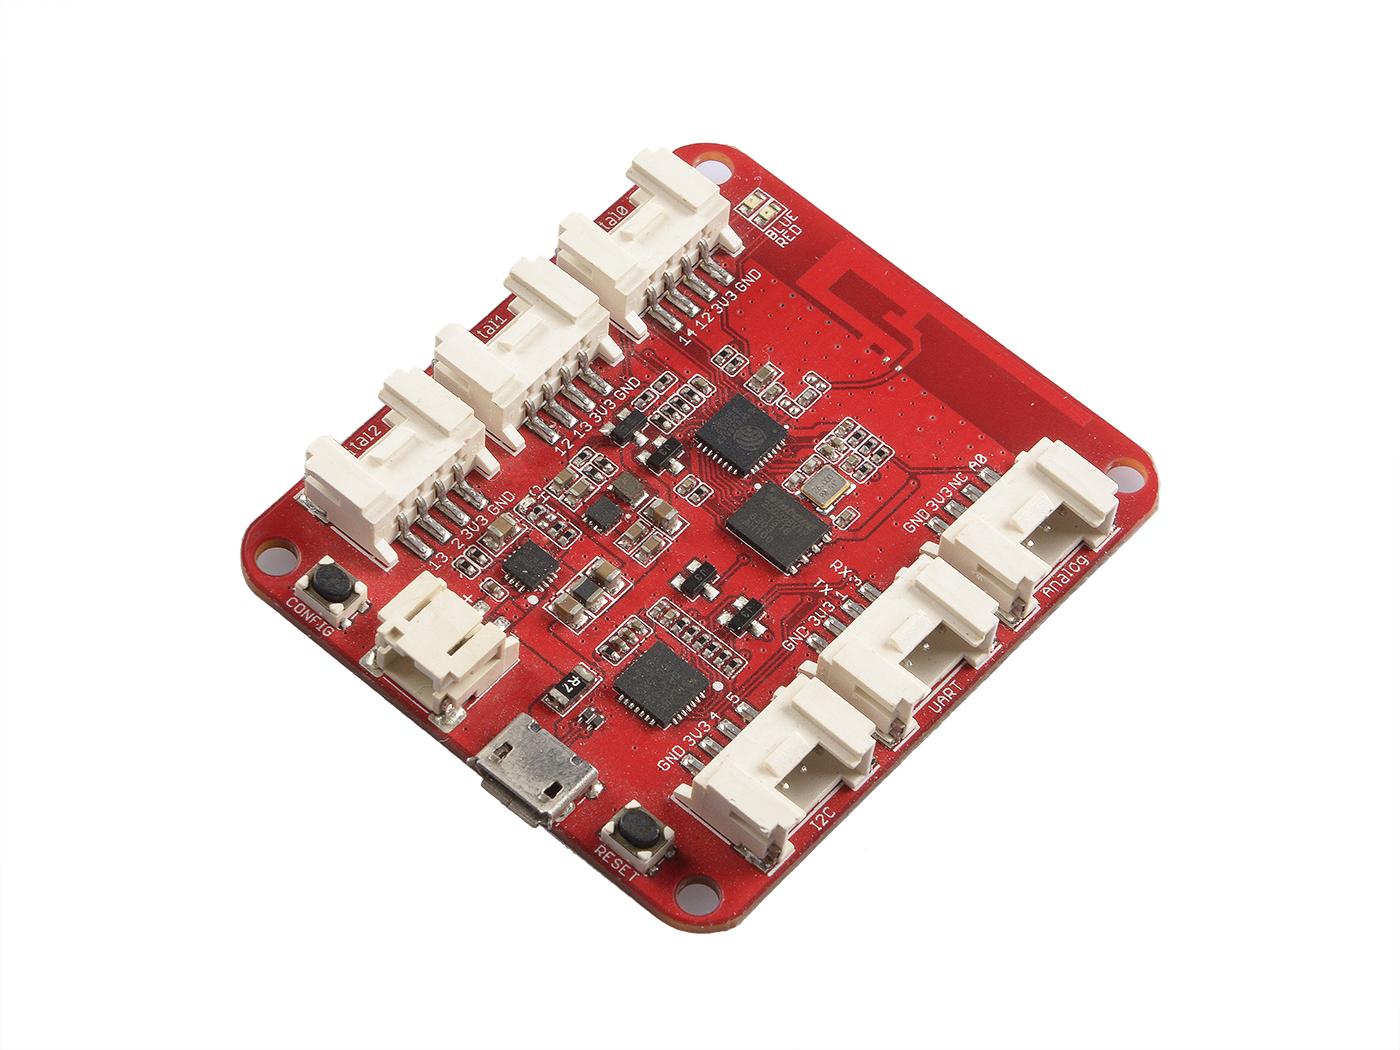 Wio Link Starter Kit Iot Home Seeed Studio Beginner Electronic Circuits